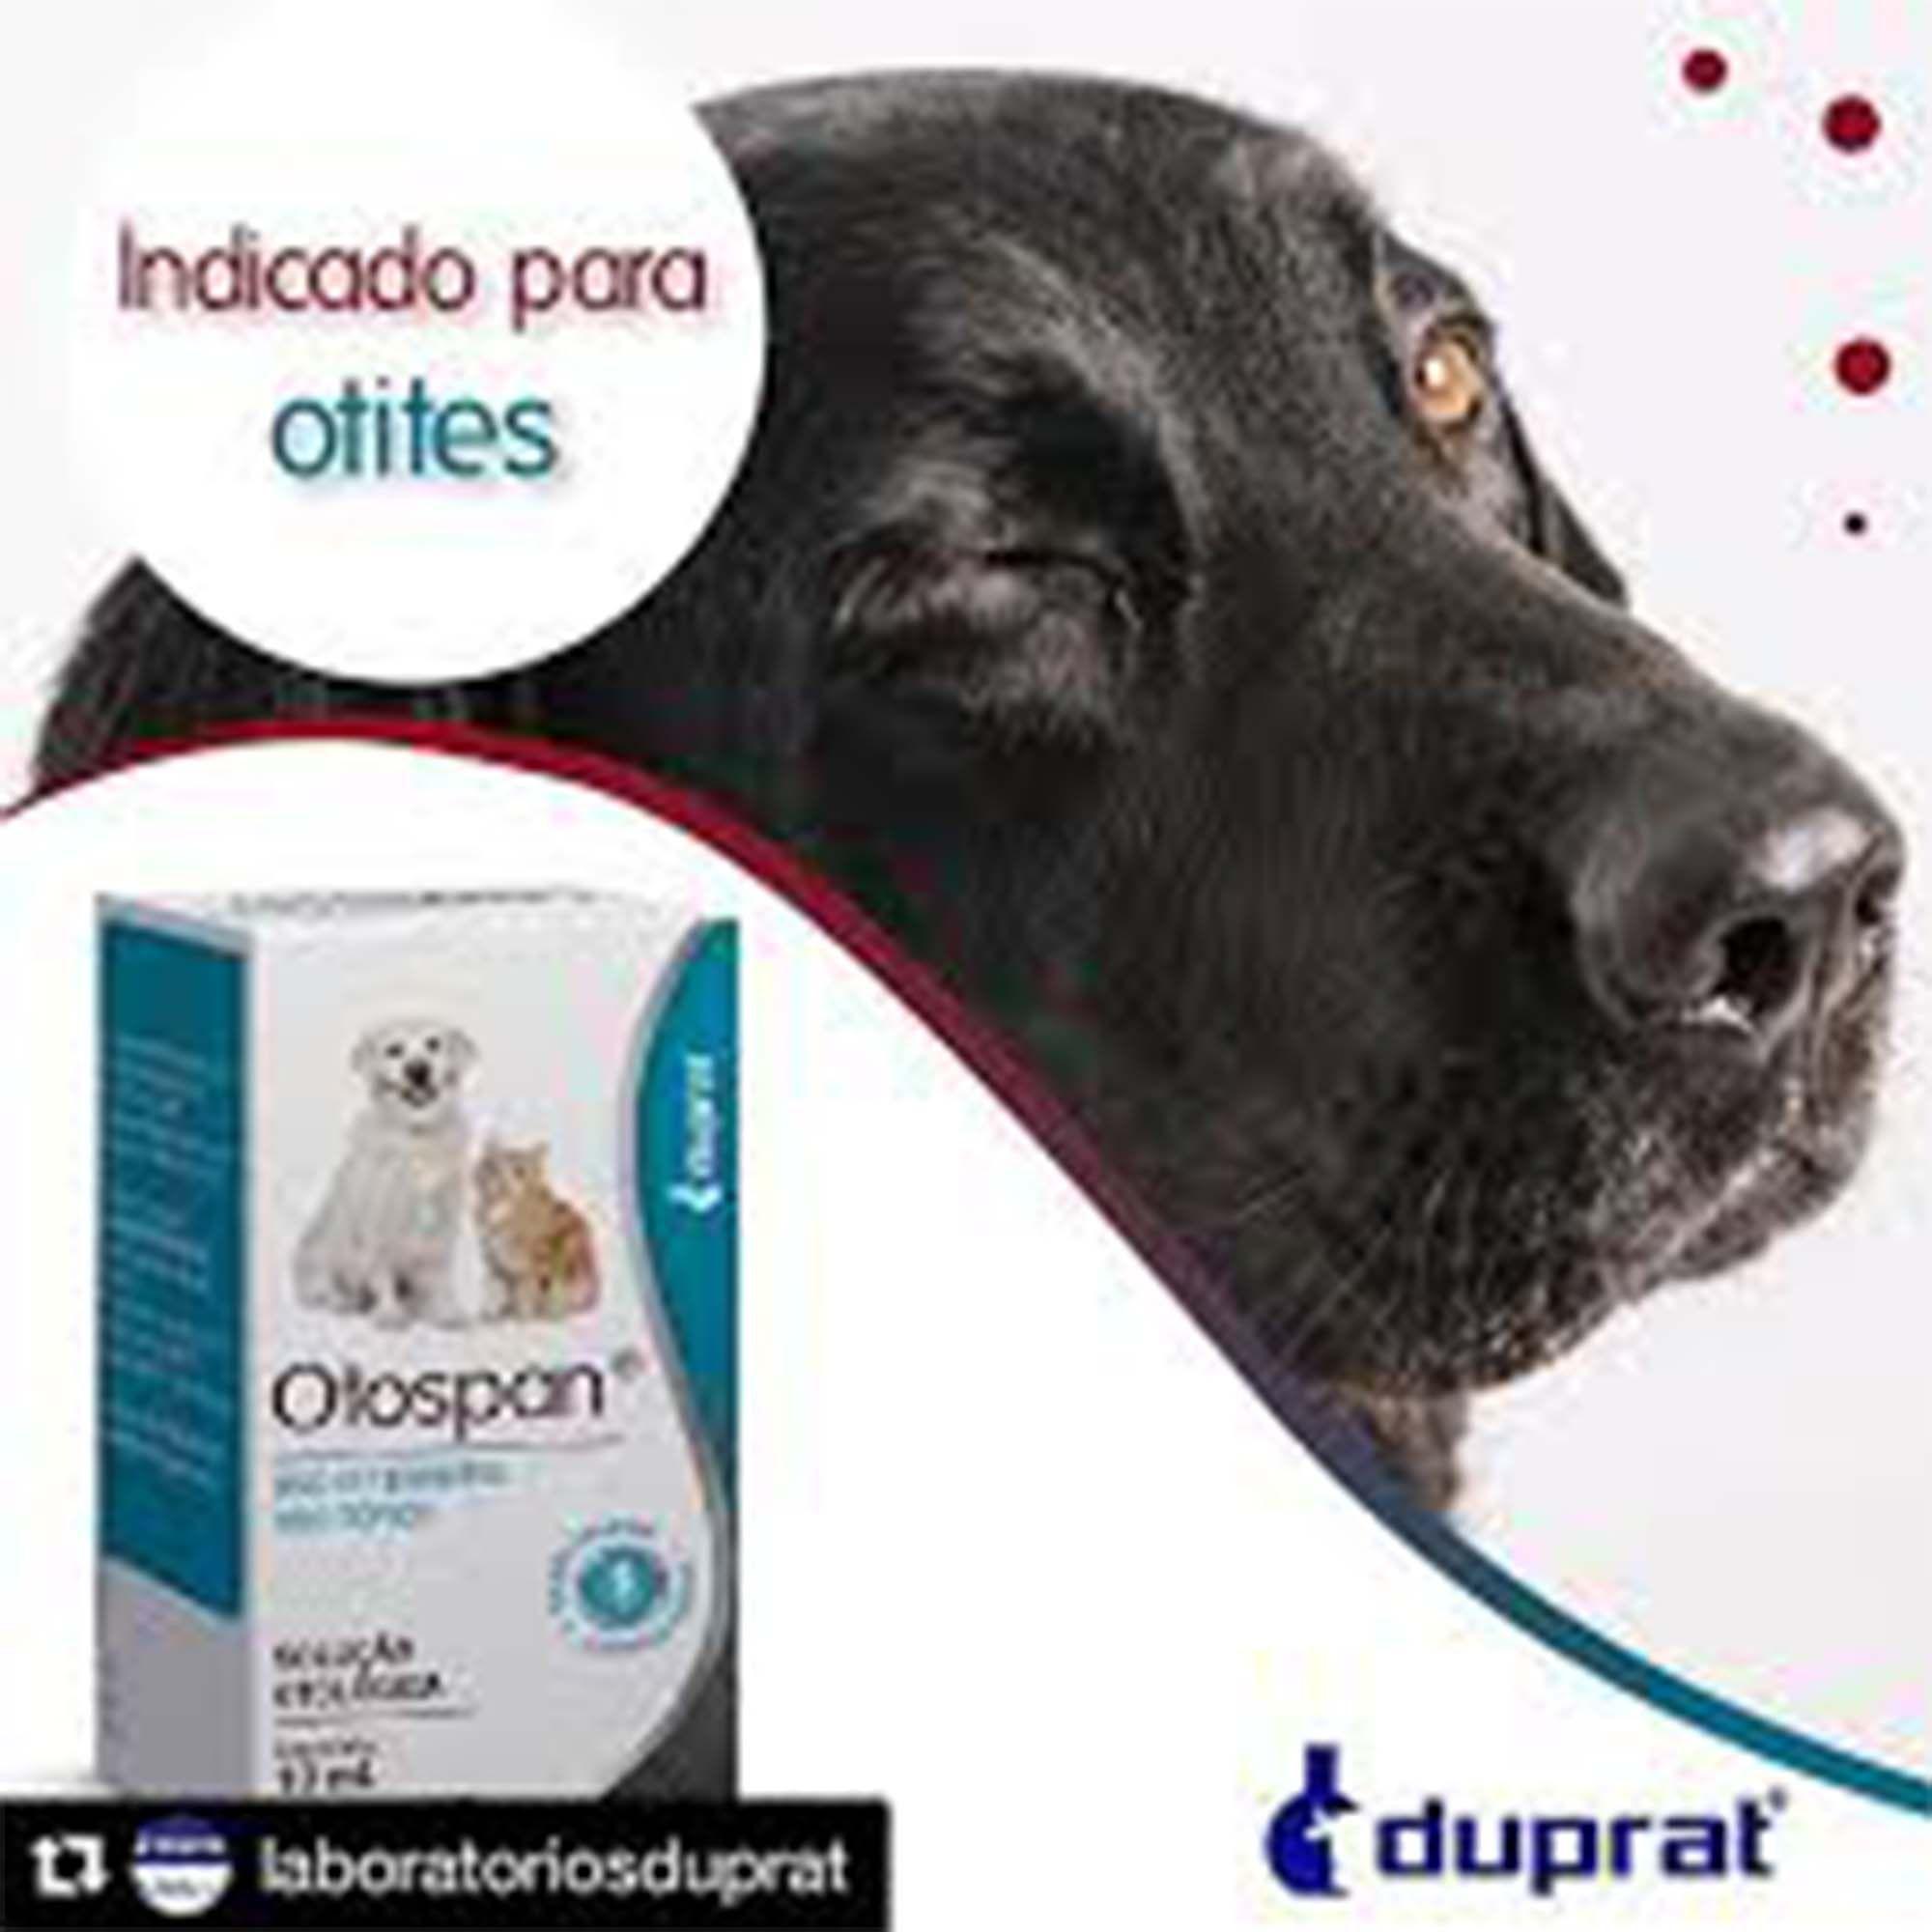 Otospan Anti-inflamatório Otológico para Cães e Gatos 10ml